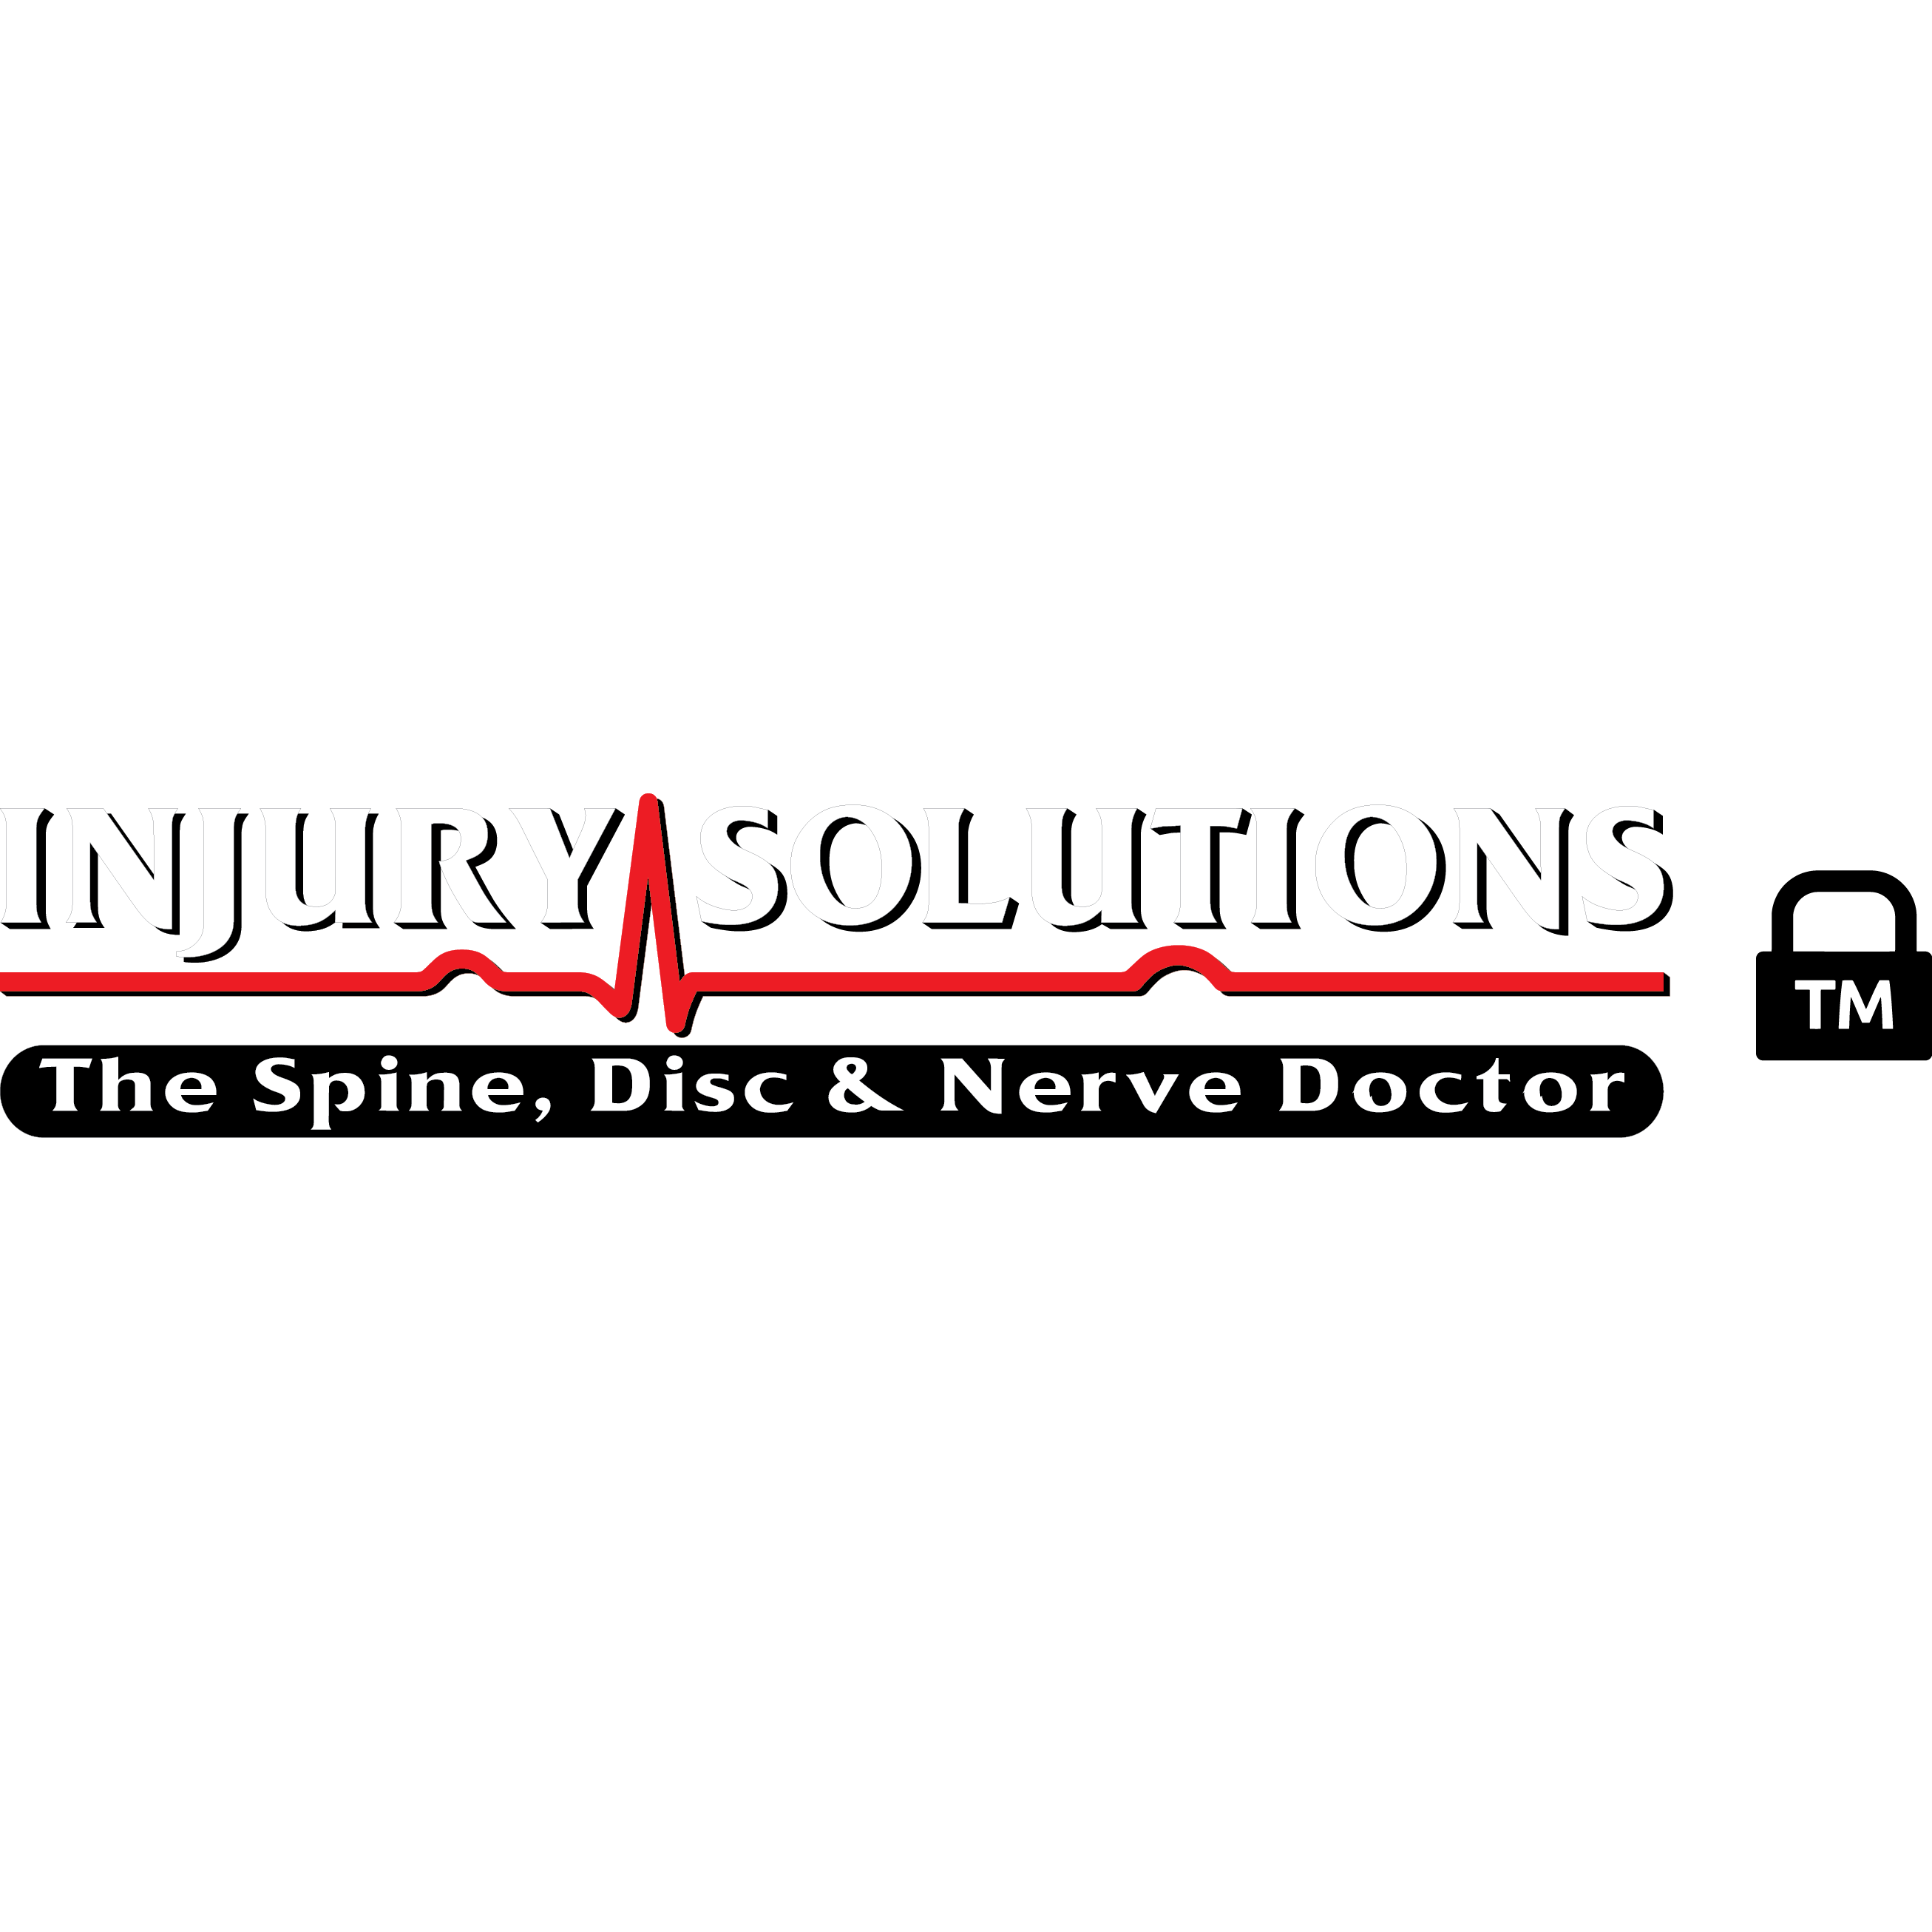 Injury Solutions, Inc. | Dr. Patrick R.E. Davis | The Spine, Disc & Nerve Doctor, Inc.